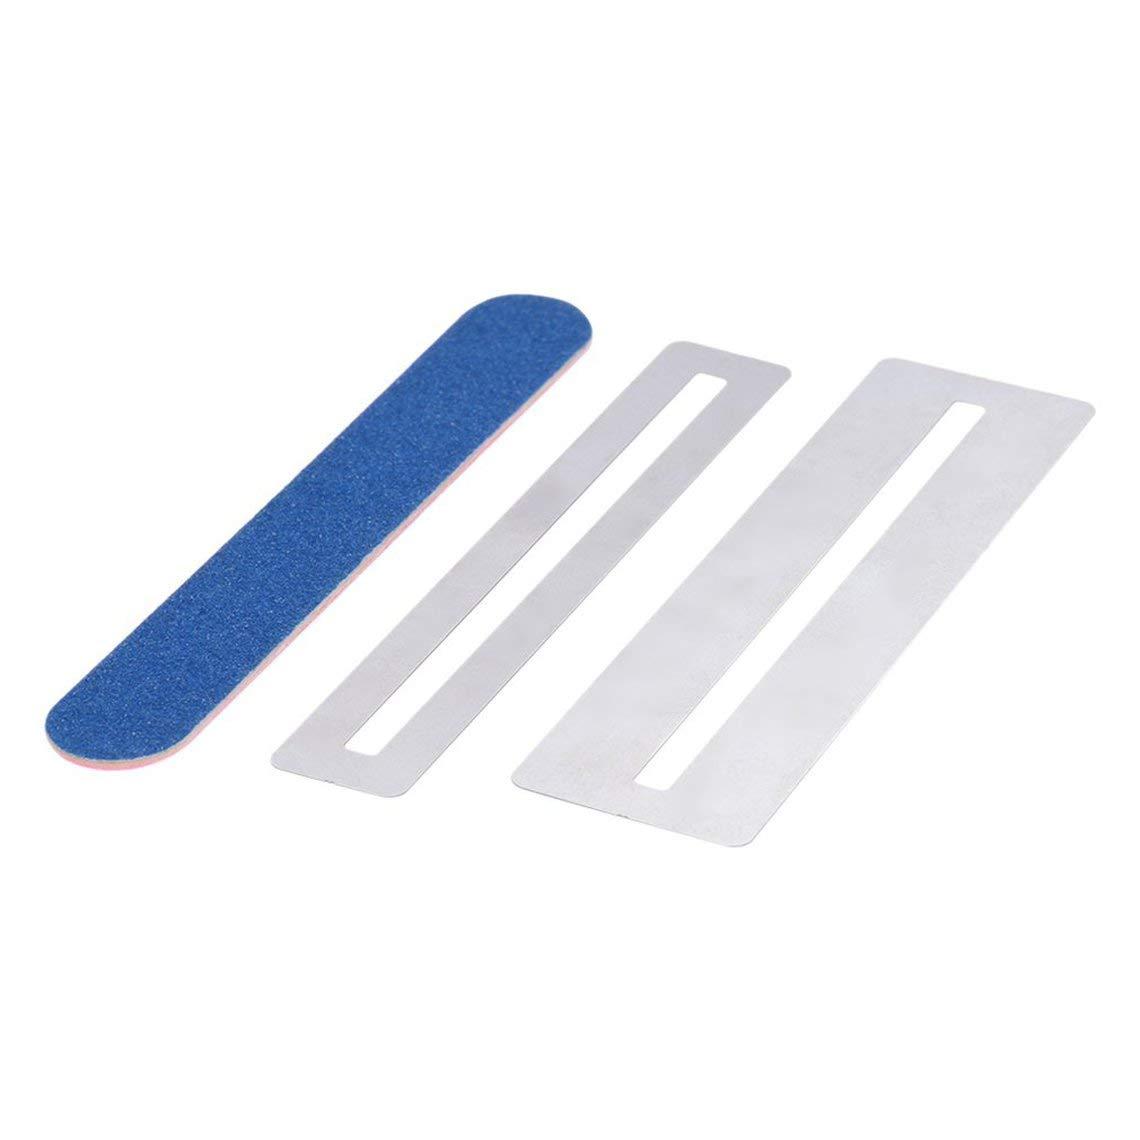 Guitar Fret Repairing Tool Set Fretboard Guard ProtectIve Shim /& Fretwire File